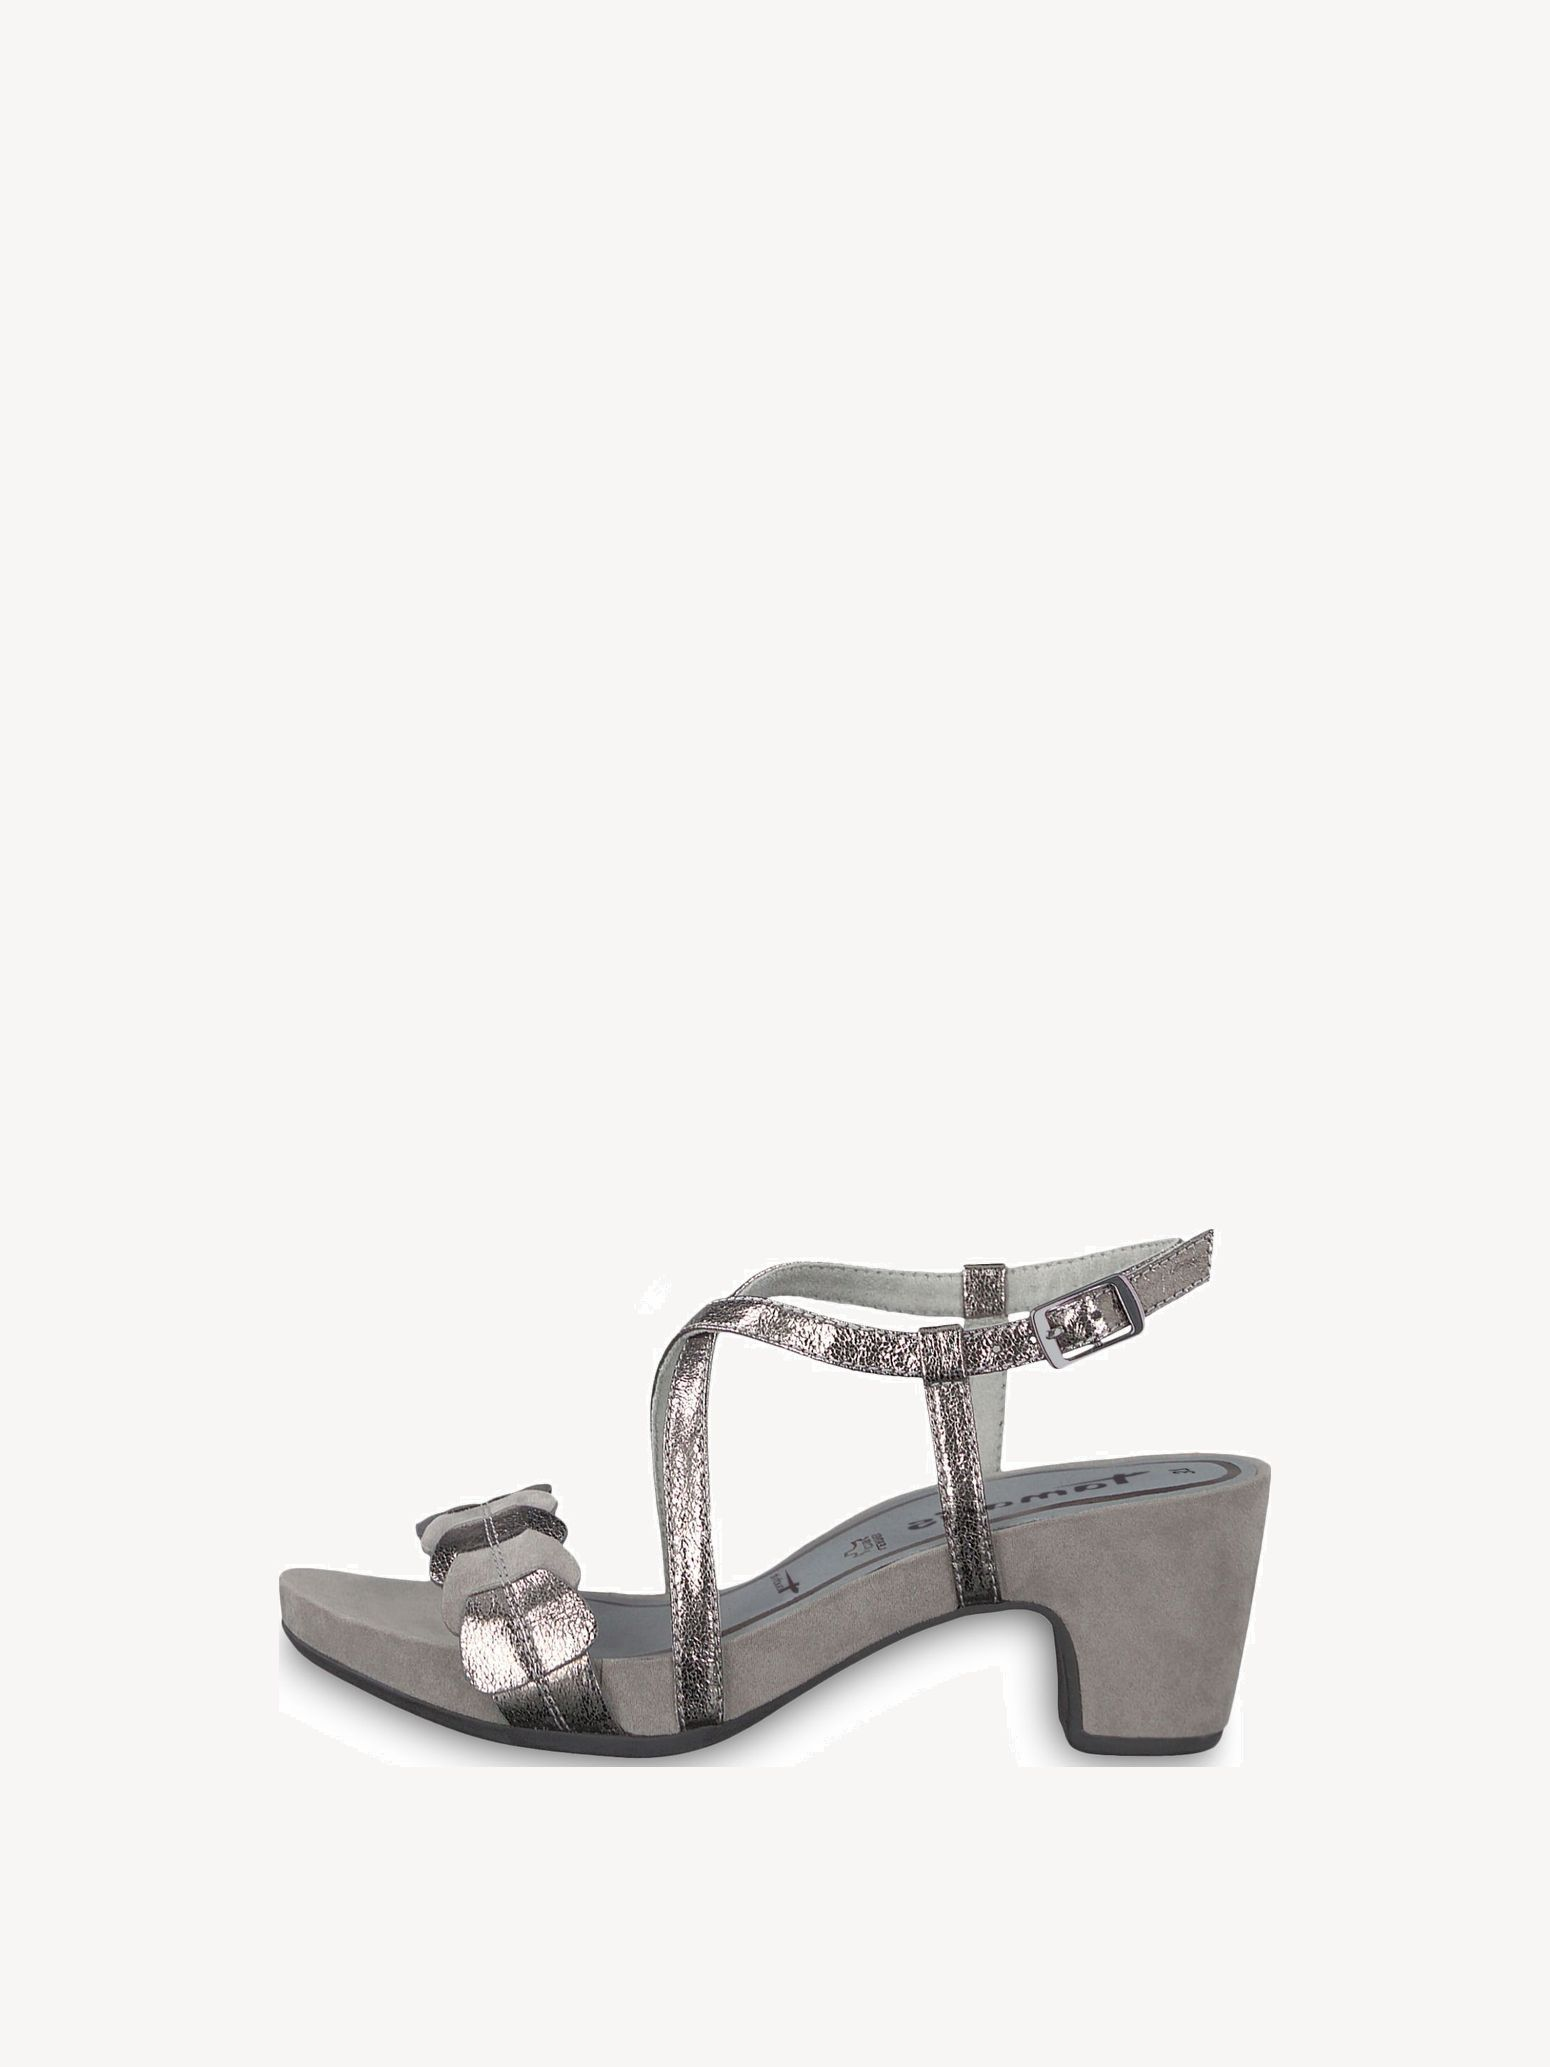 Sandals TAMARIS 1 28391 20 CloudPewter 220